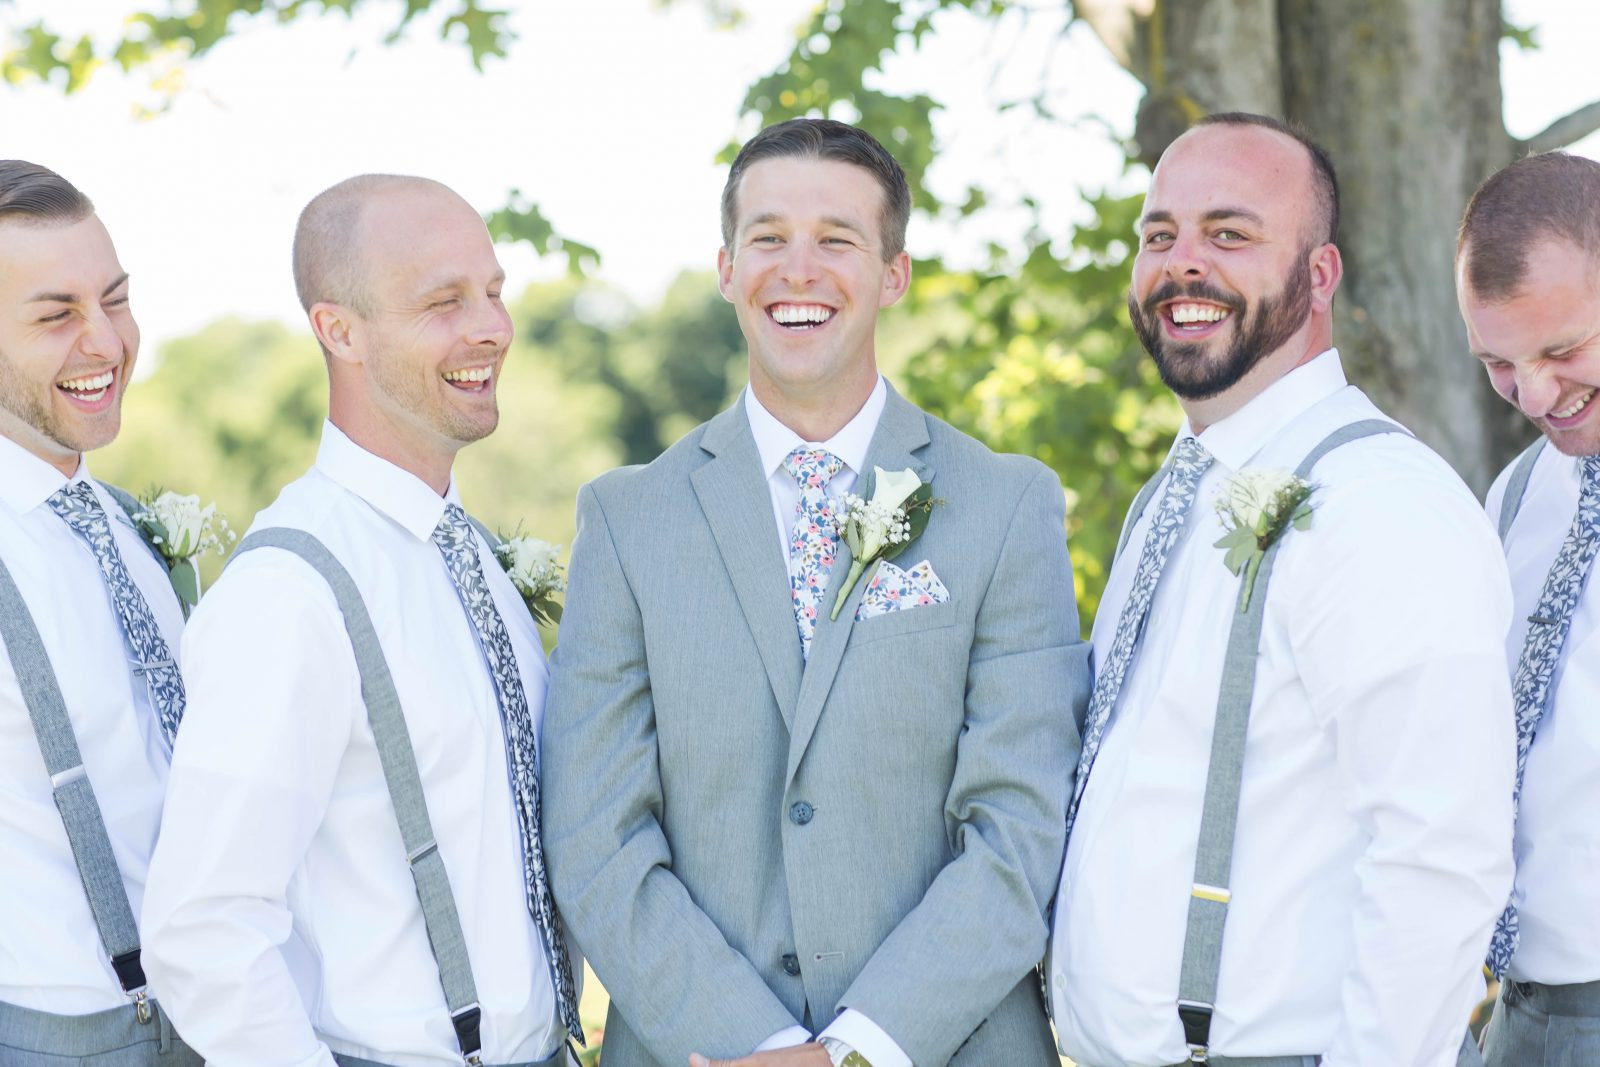 peacock-ridge-summer-wedding-photographer-akron-ohio-loren-jackson-photography-64